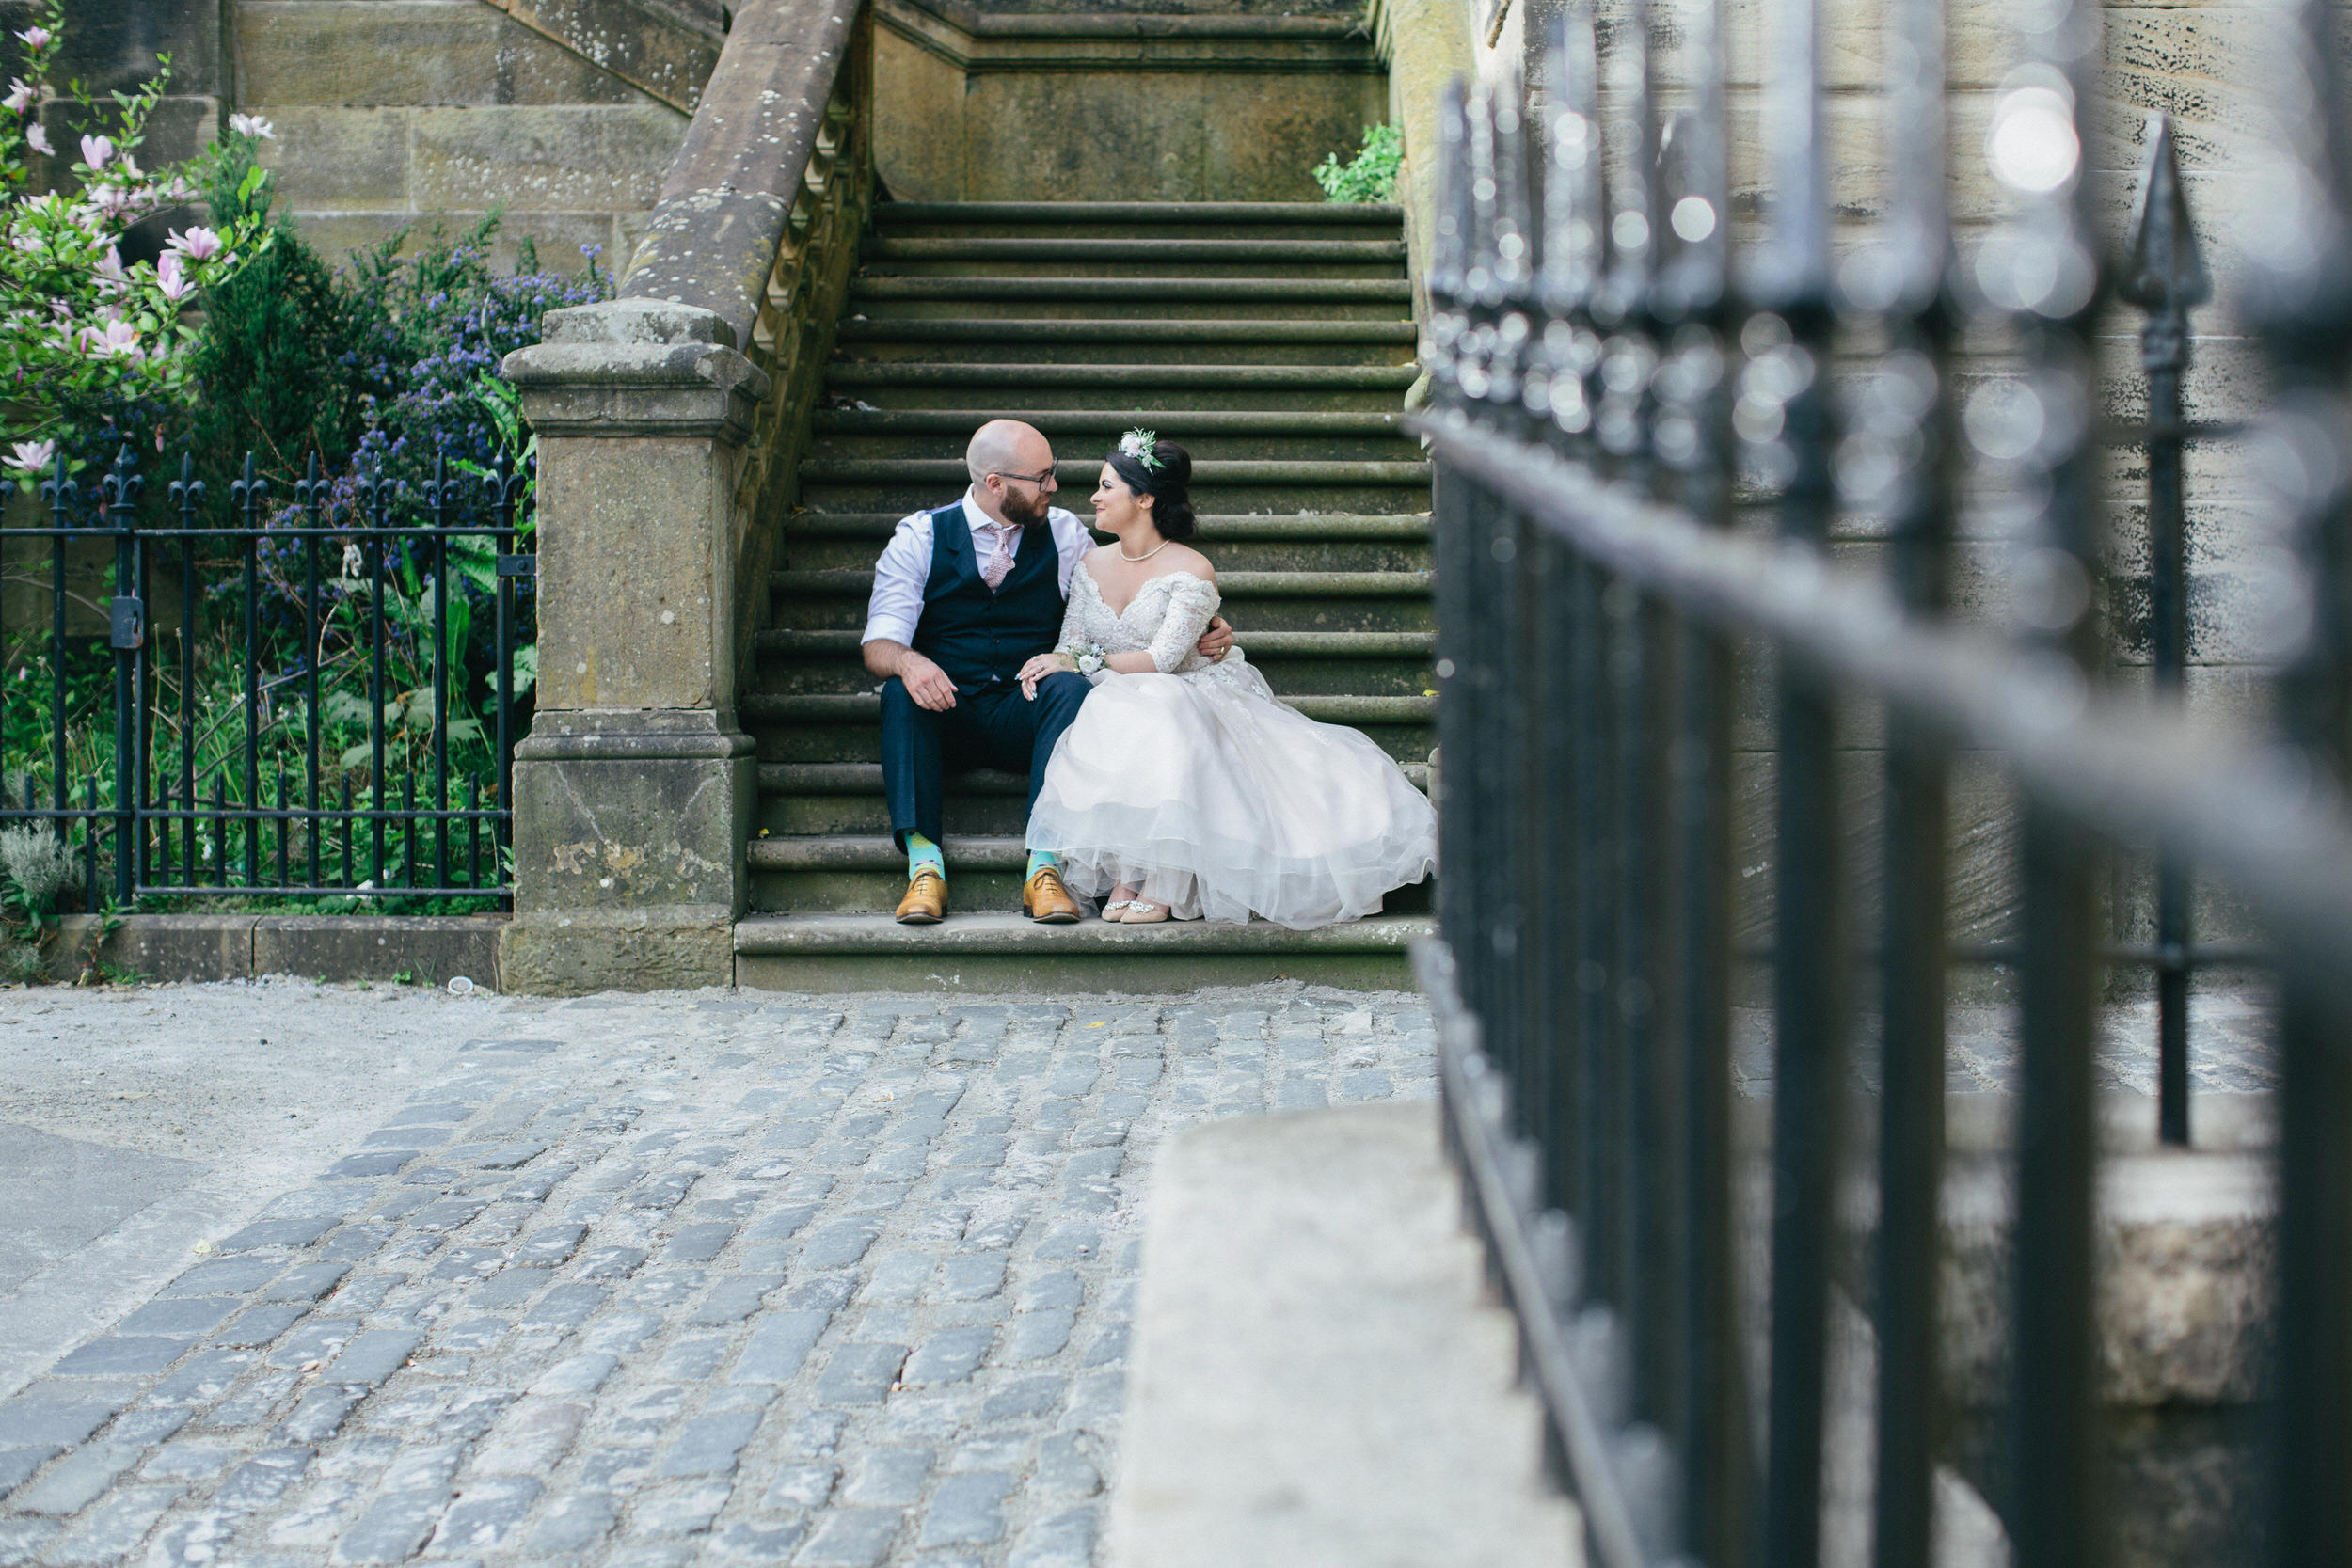 Quirky Wedding Photographer Scotland Glasgow Edinburgh Mirrorbox 162.jpg